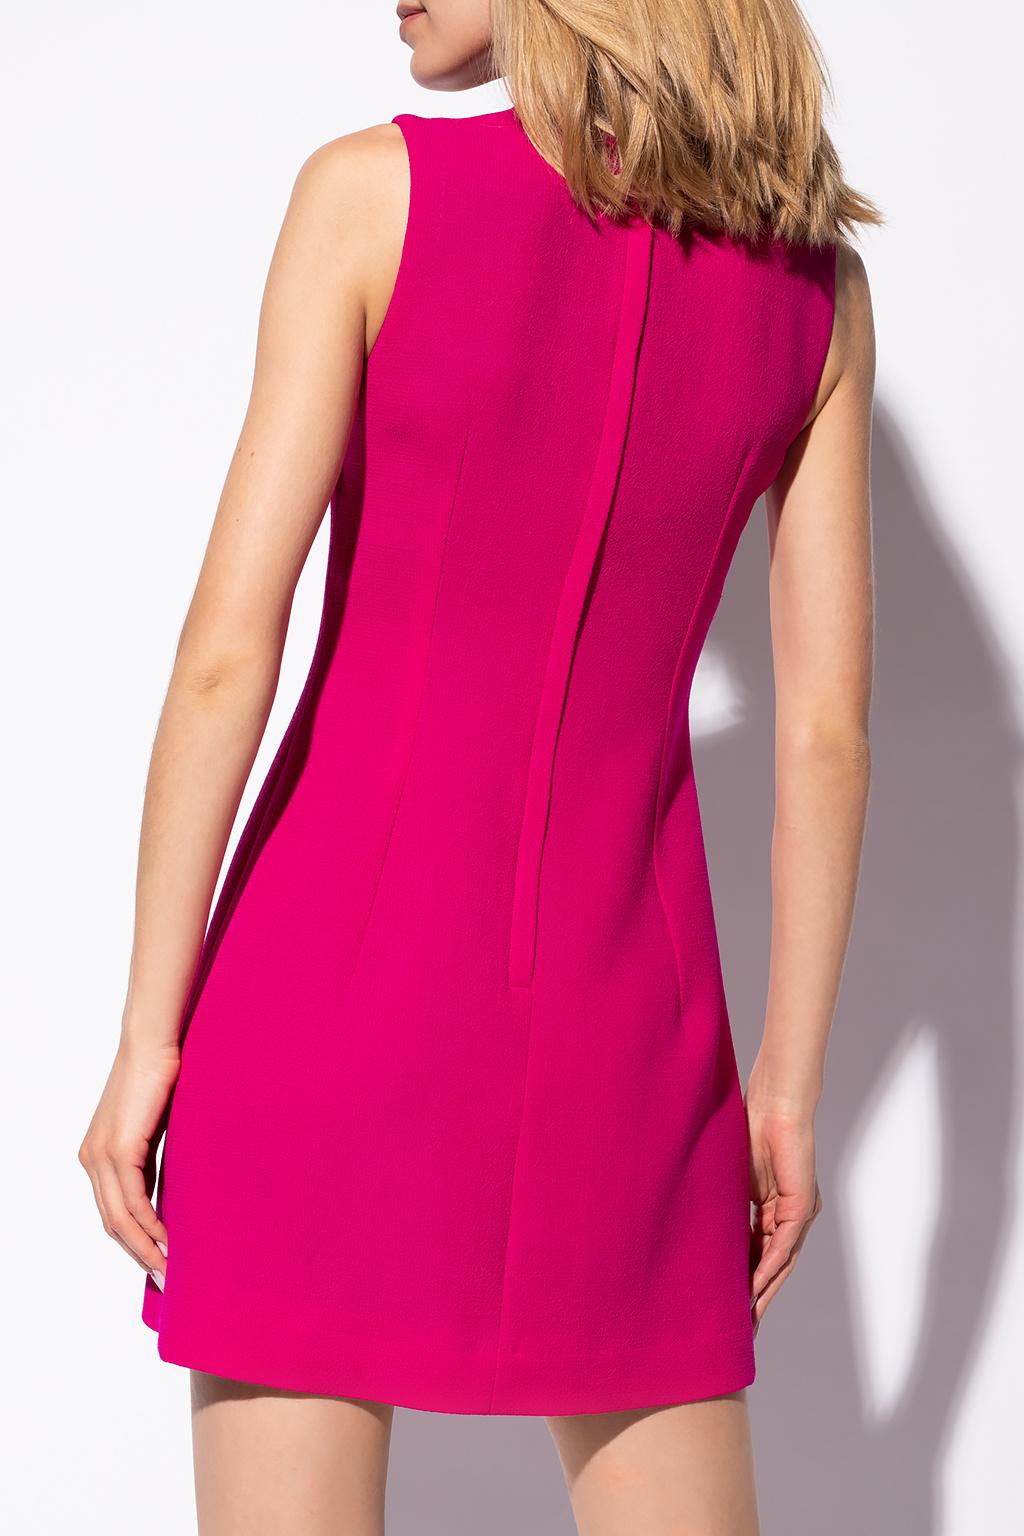 Dolce & Gabbana 无袖连衣裙